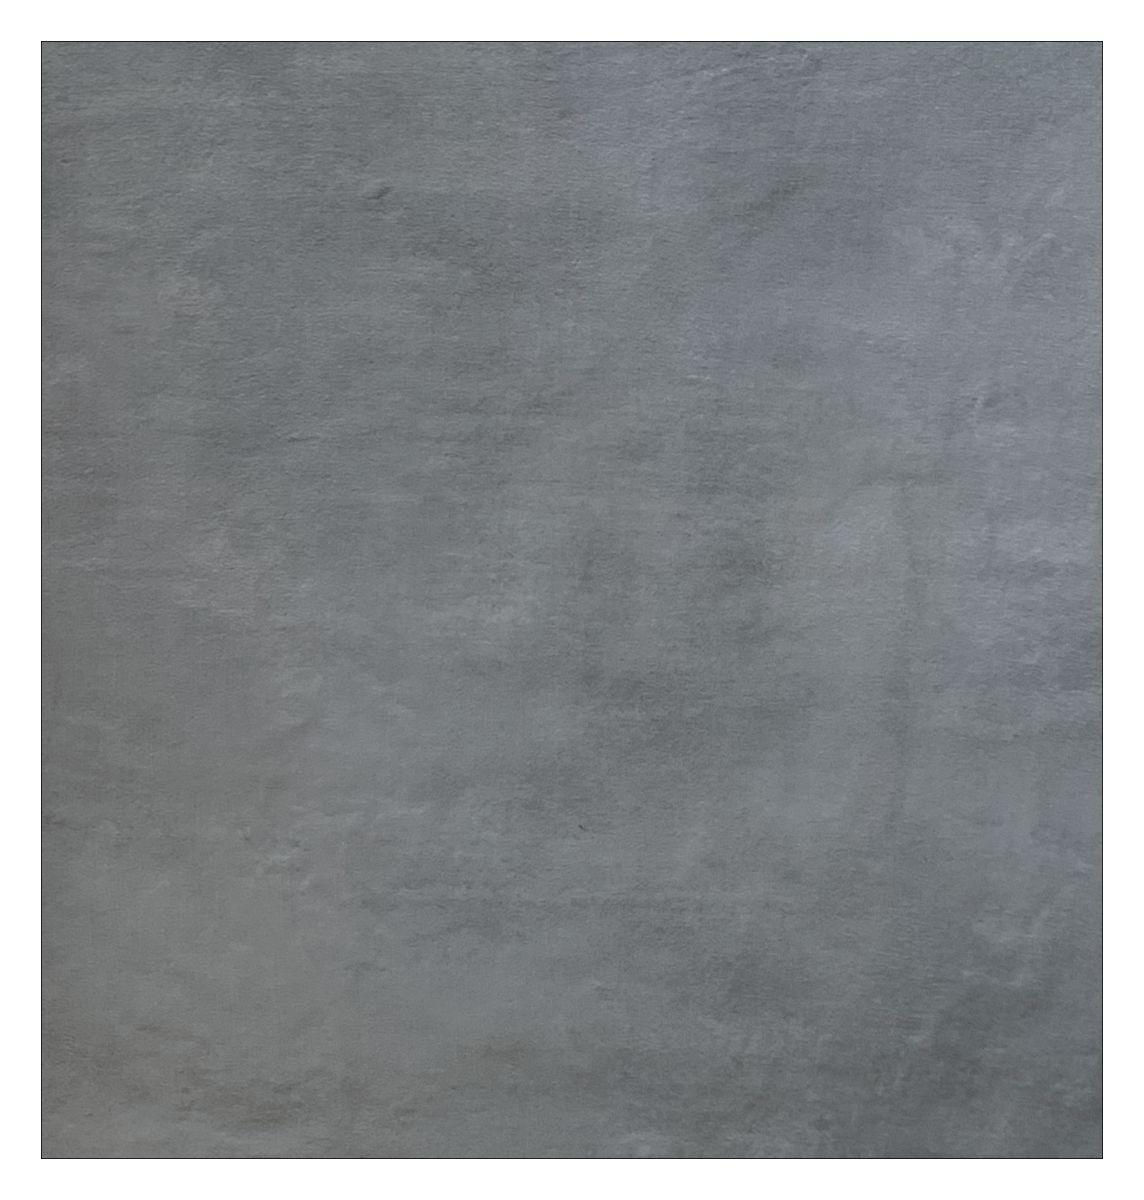 vloertegel 100100 cm betonlook donker grijs